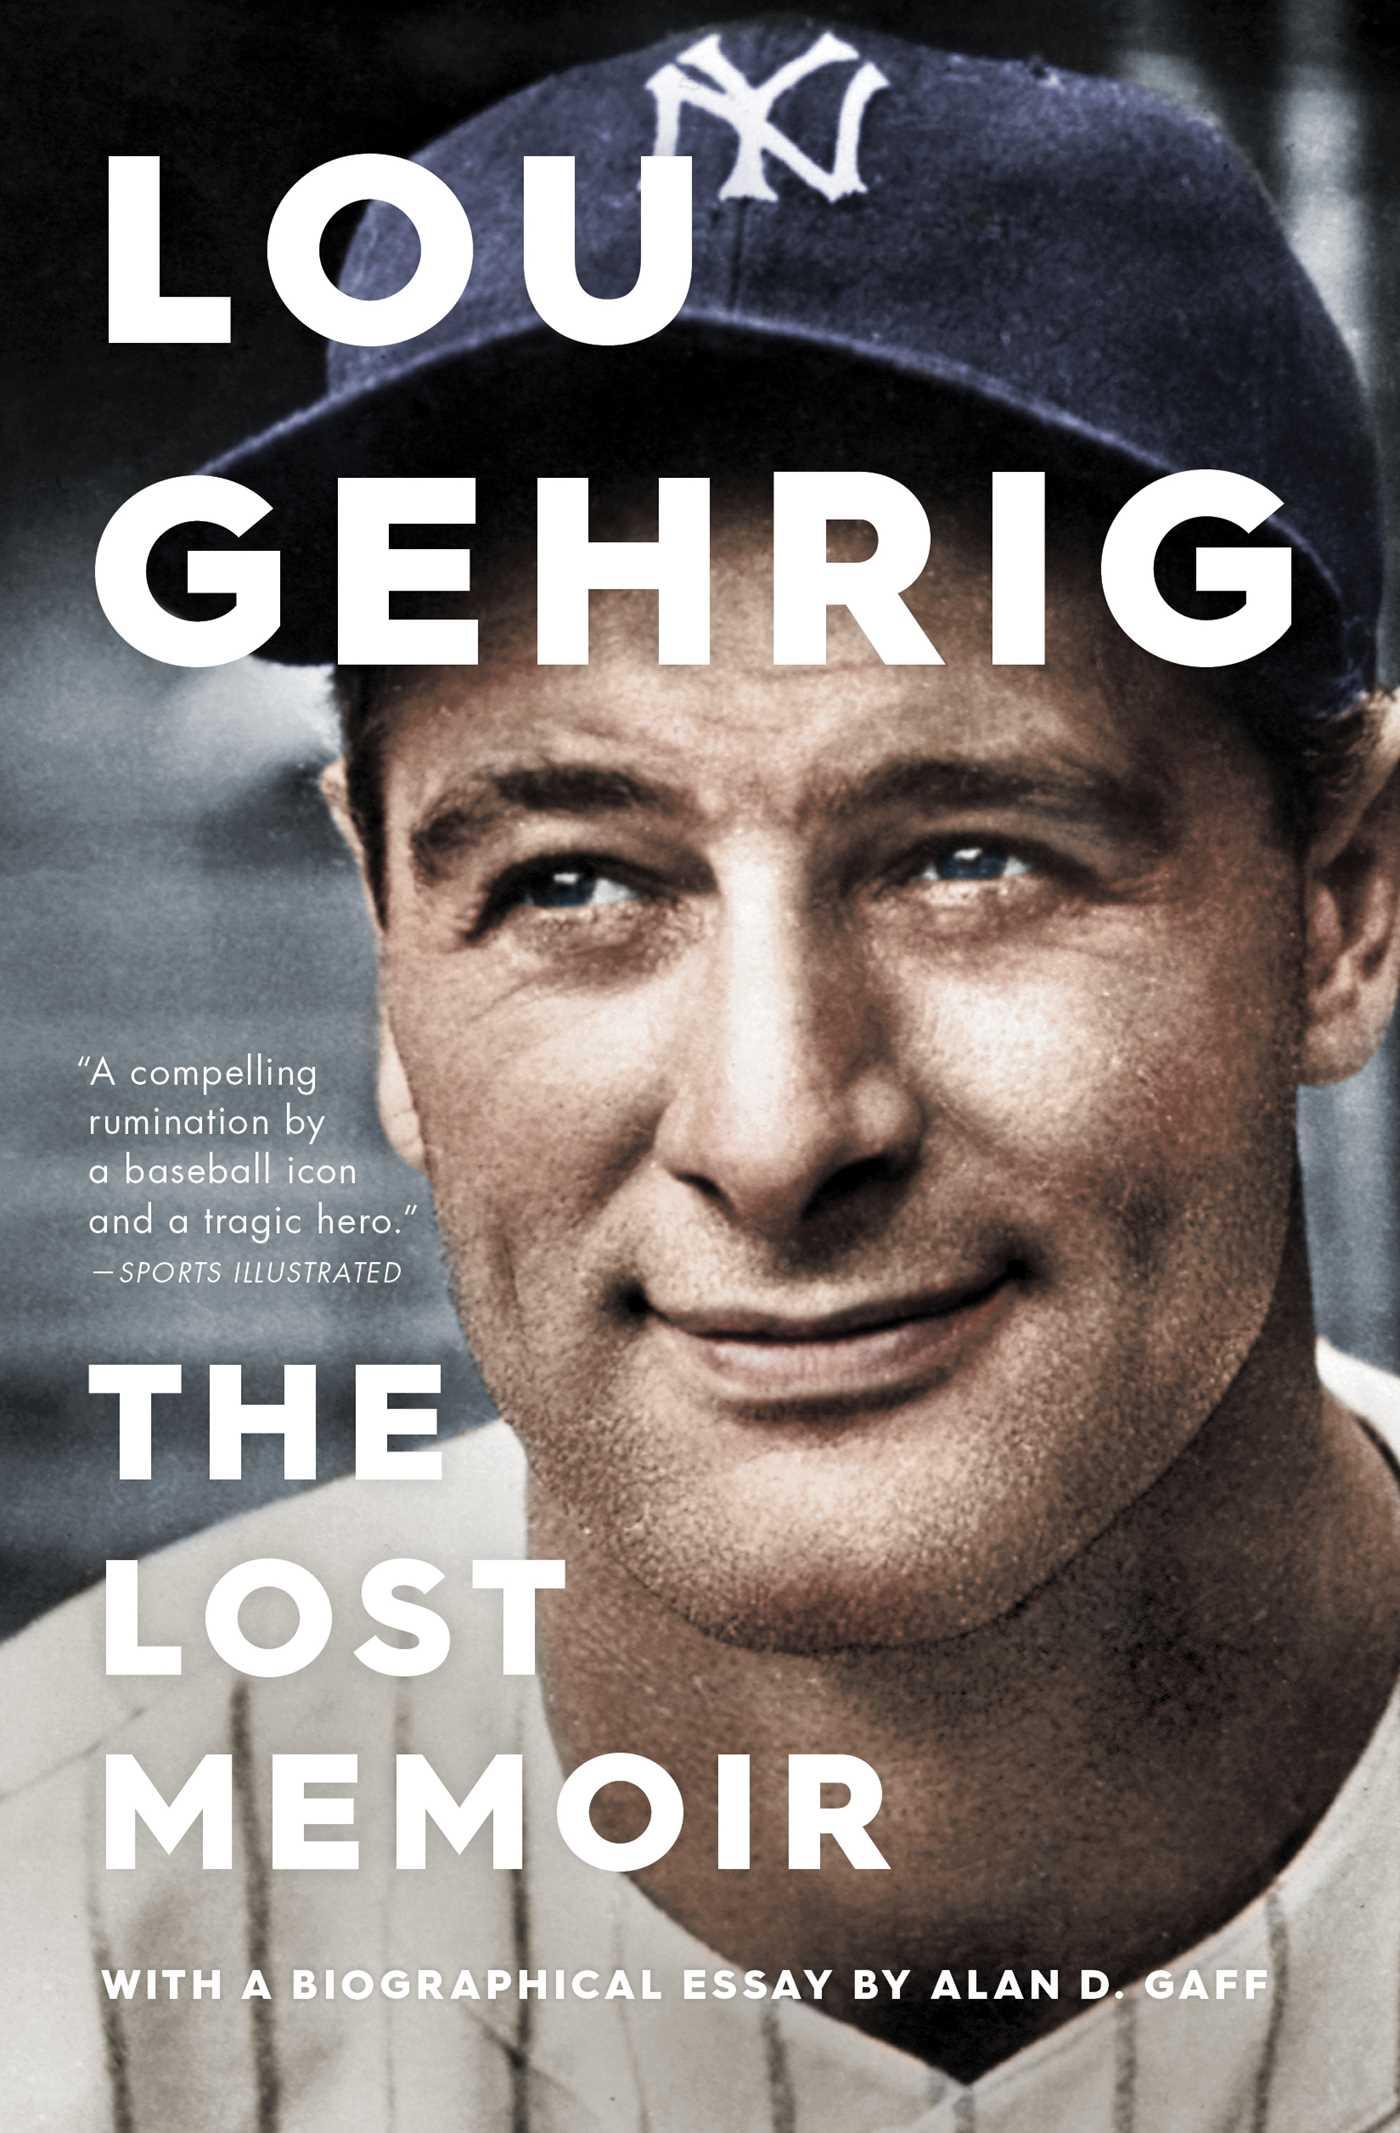 Lou Gehrig [electronic resource (downloadable eBook)] : the Lost Memoir